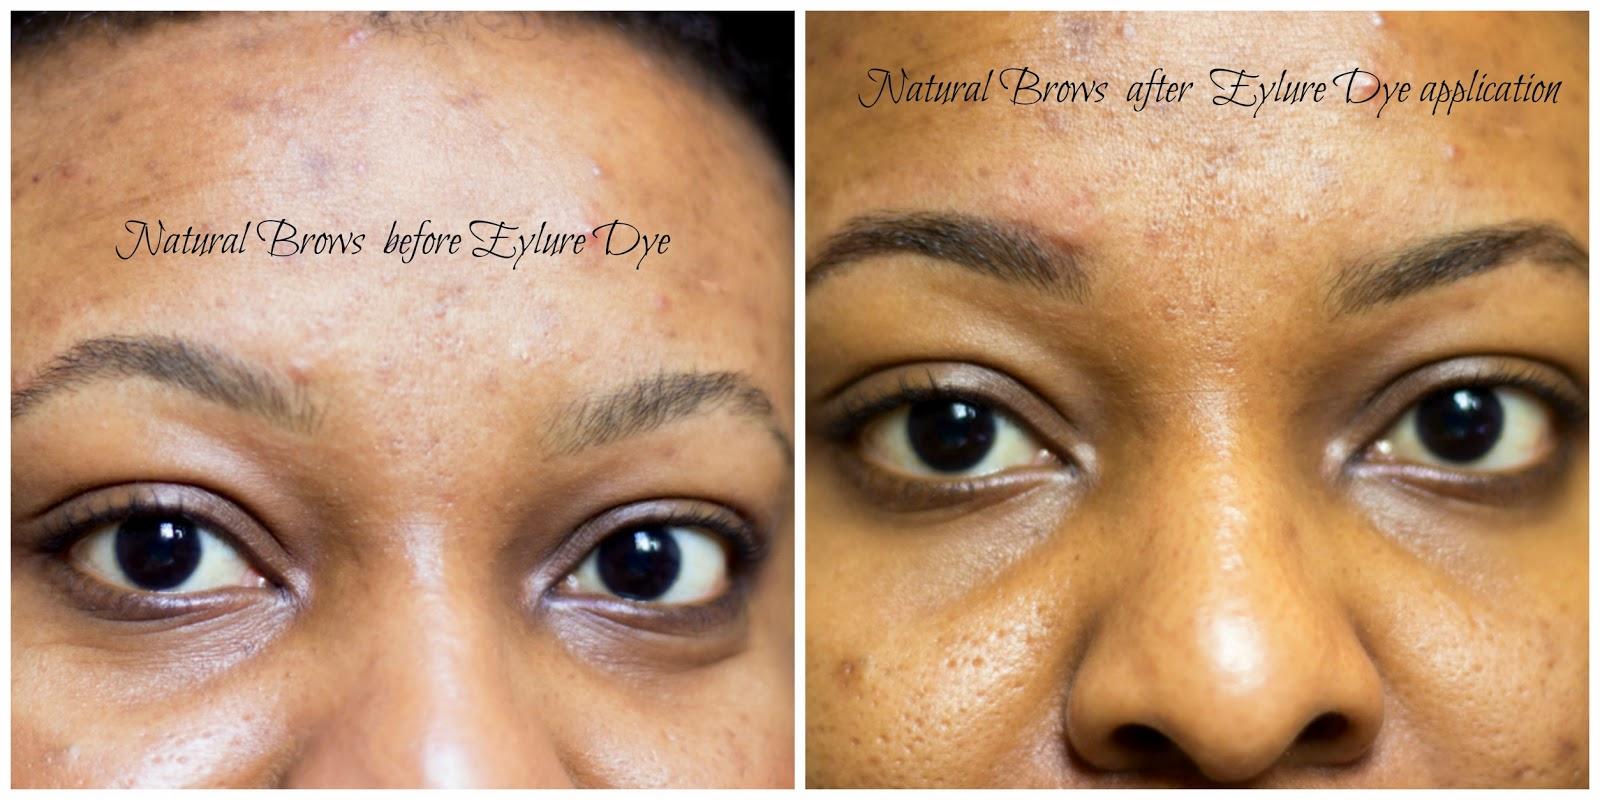 Fashstyleliv Eylure Dip Brow Review Diy Tinting My Eyebrows